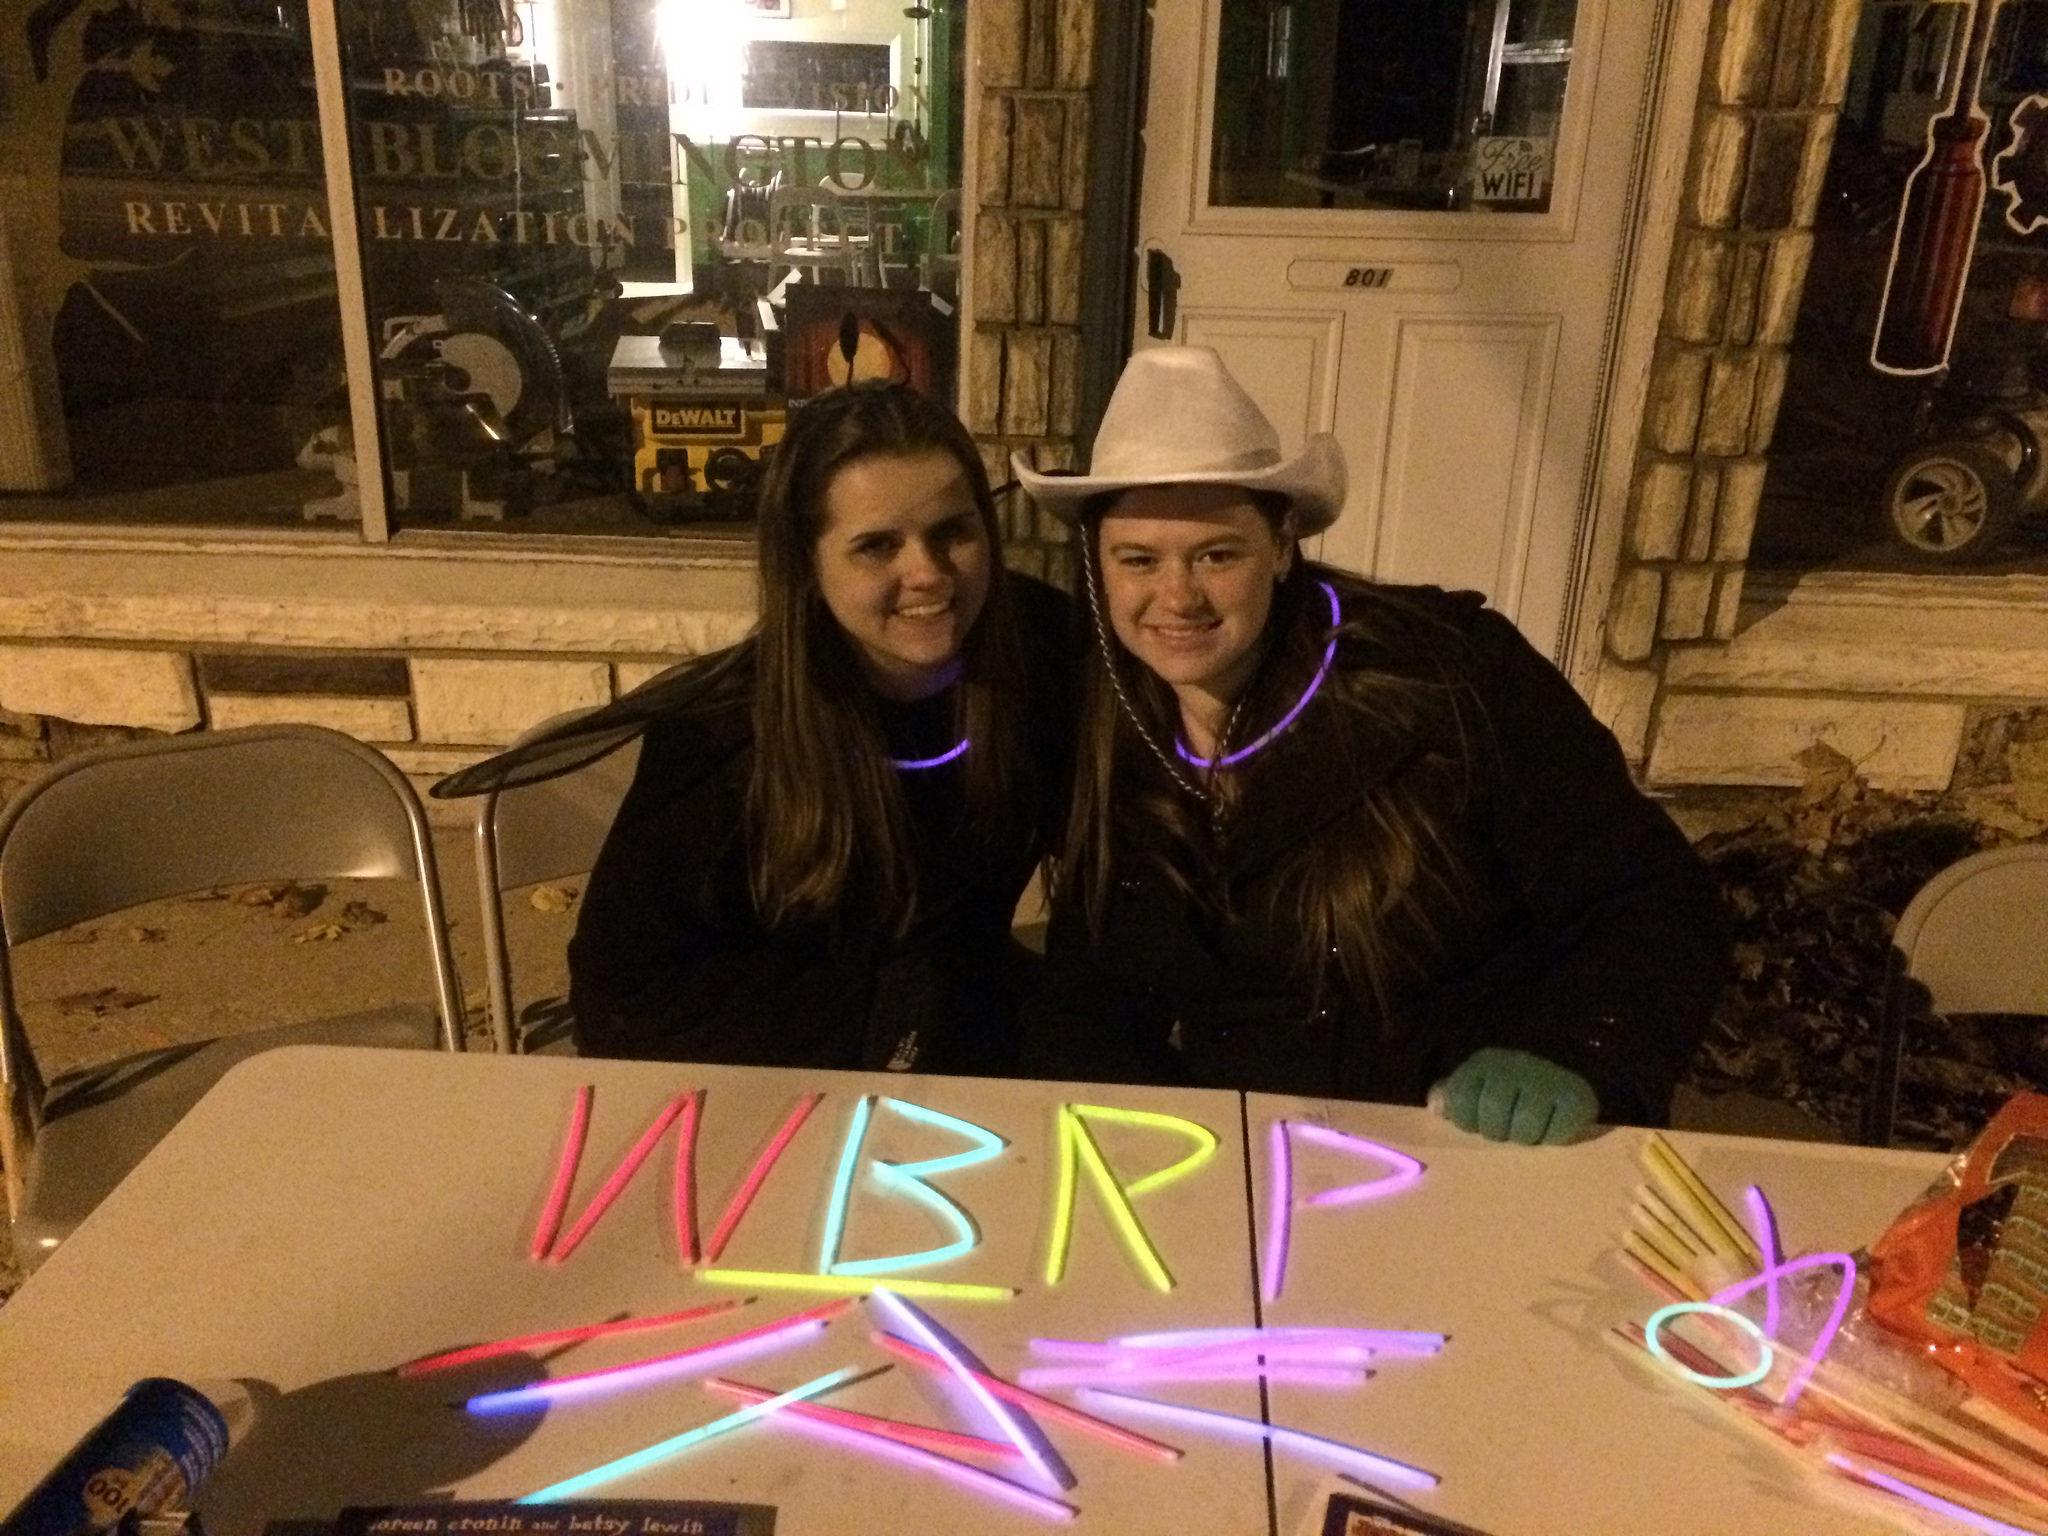 Kelli Sloan '15 and Jenna Noland '16